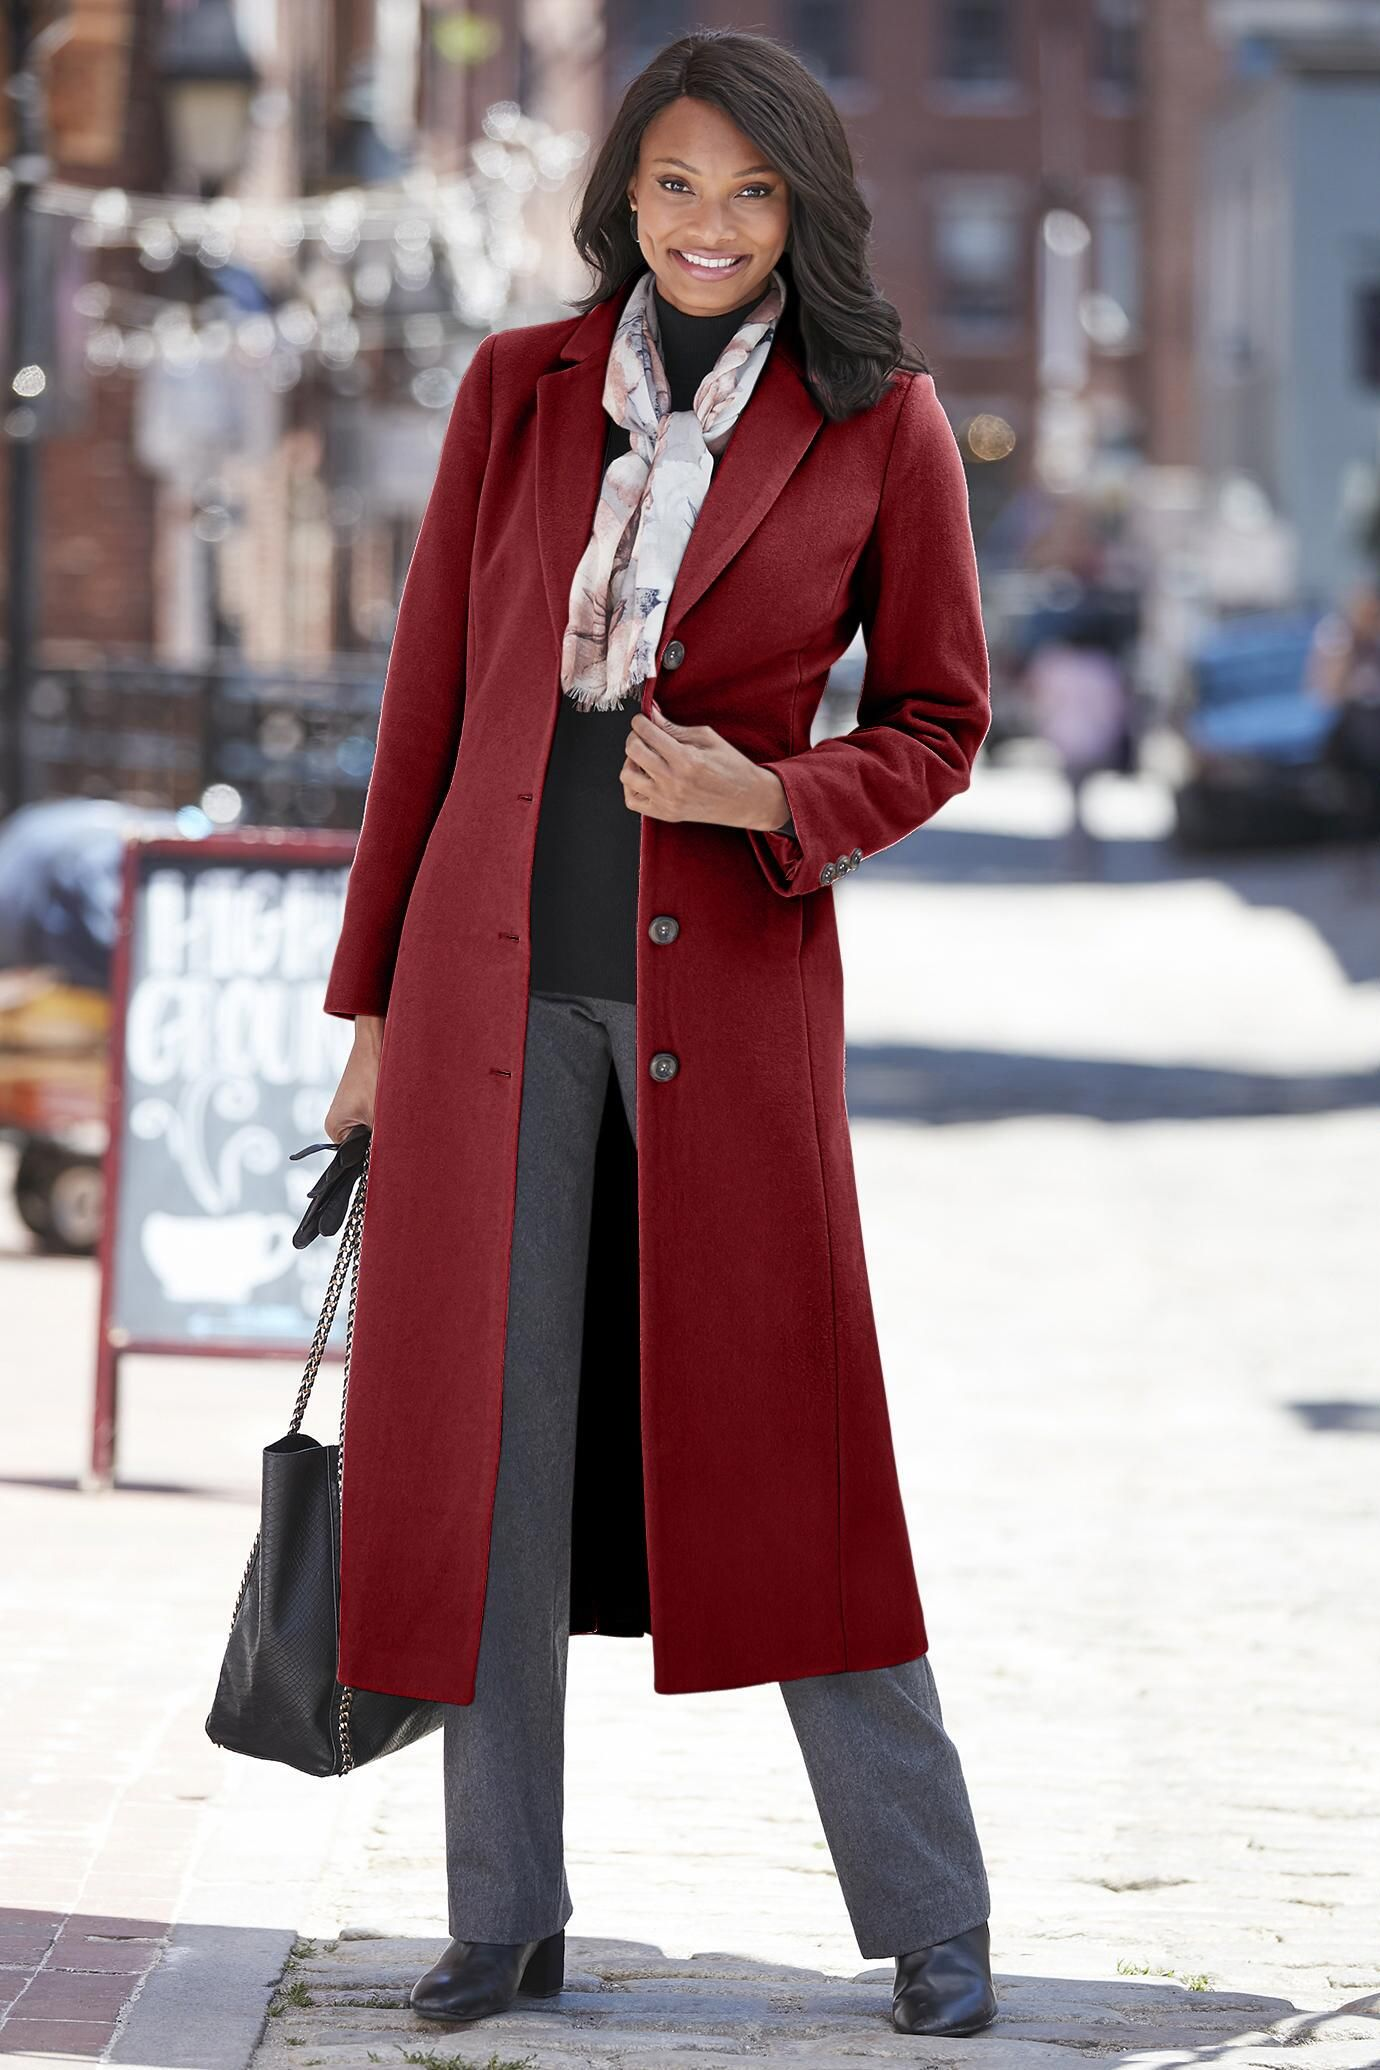 Long Wool Blend Coat Classic Women S Clothing From Chadwicksofboston 129 99 Long Winter Coats Women Coat Wool Blend Coat [ 2070 x 1380 Pixel ]